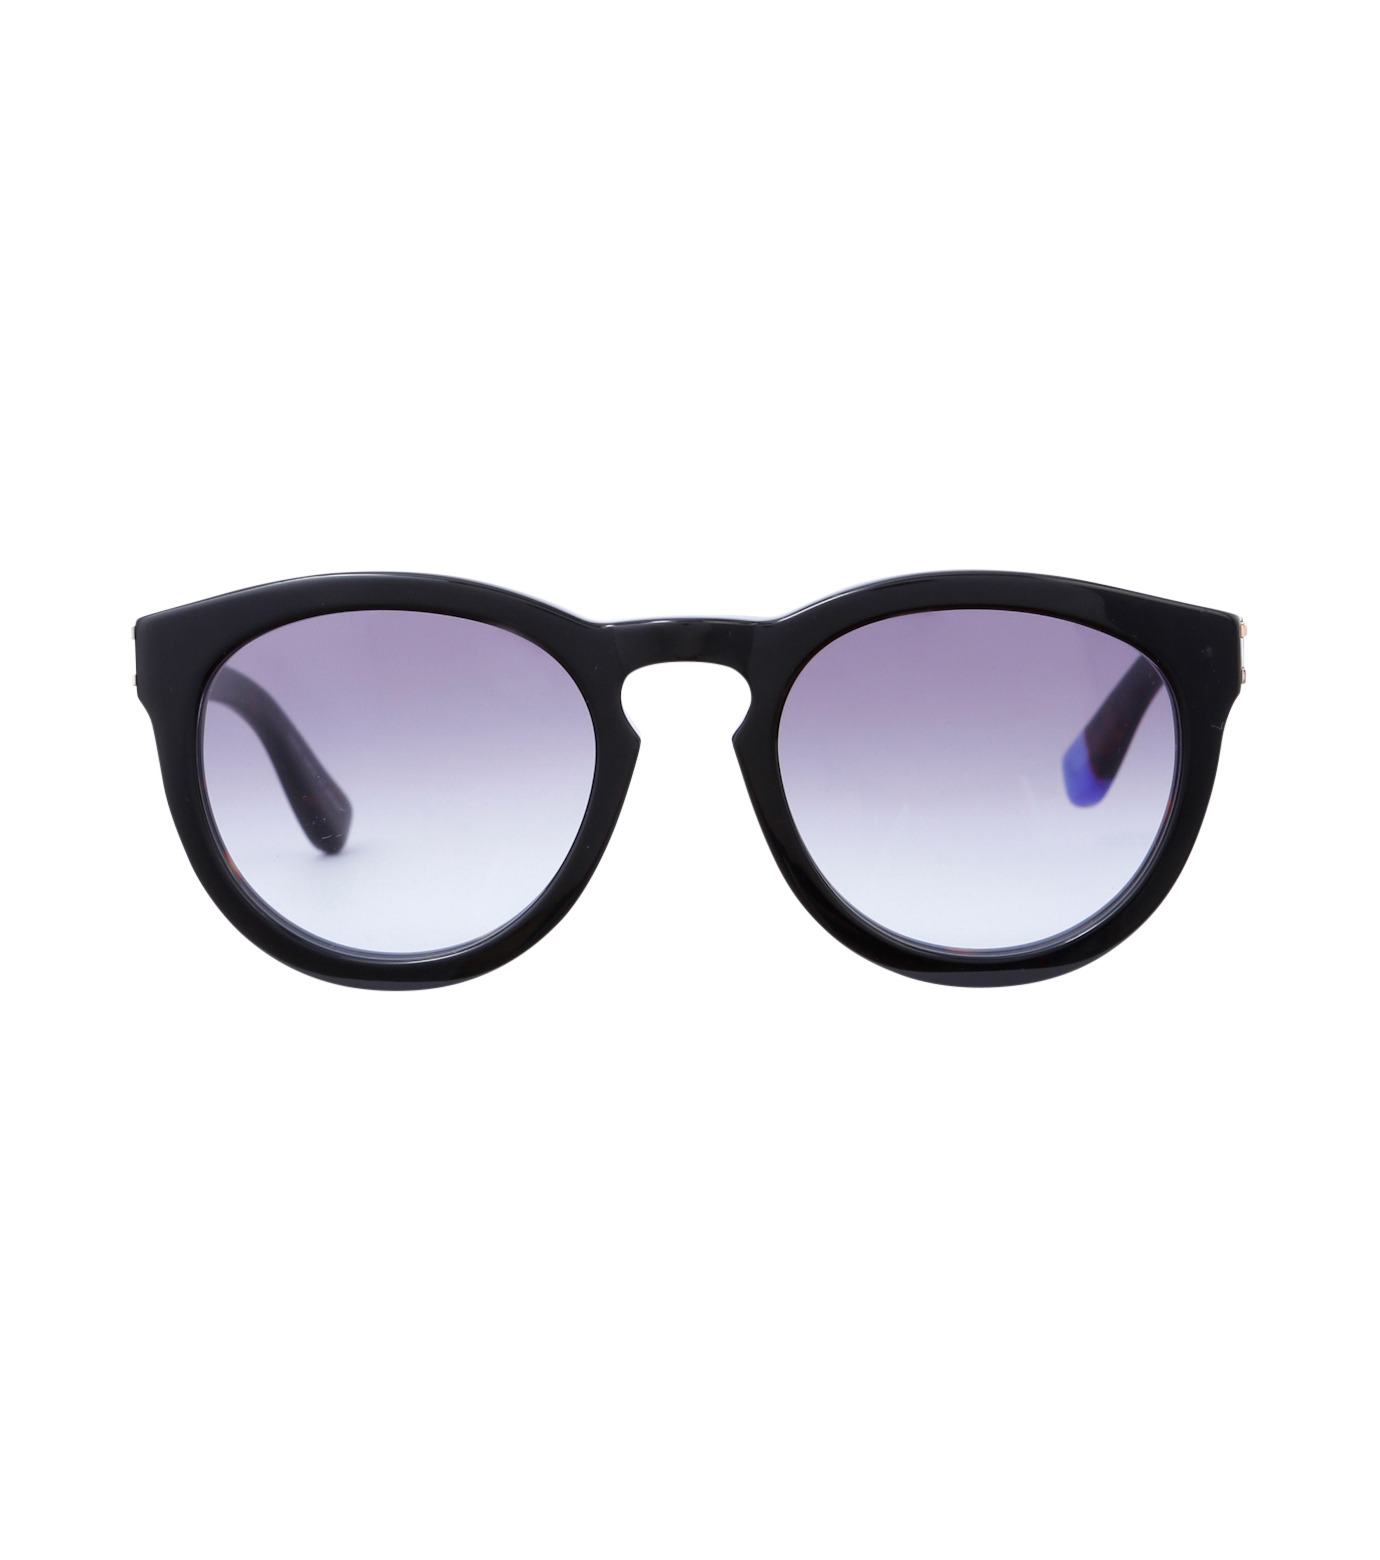 BLANC(ブラン)のThick Frame Sunglass-BLACK(アイウェア/eyewear)-B0007-N-13 拡大詳細画像3